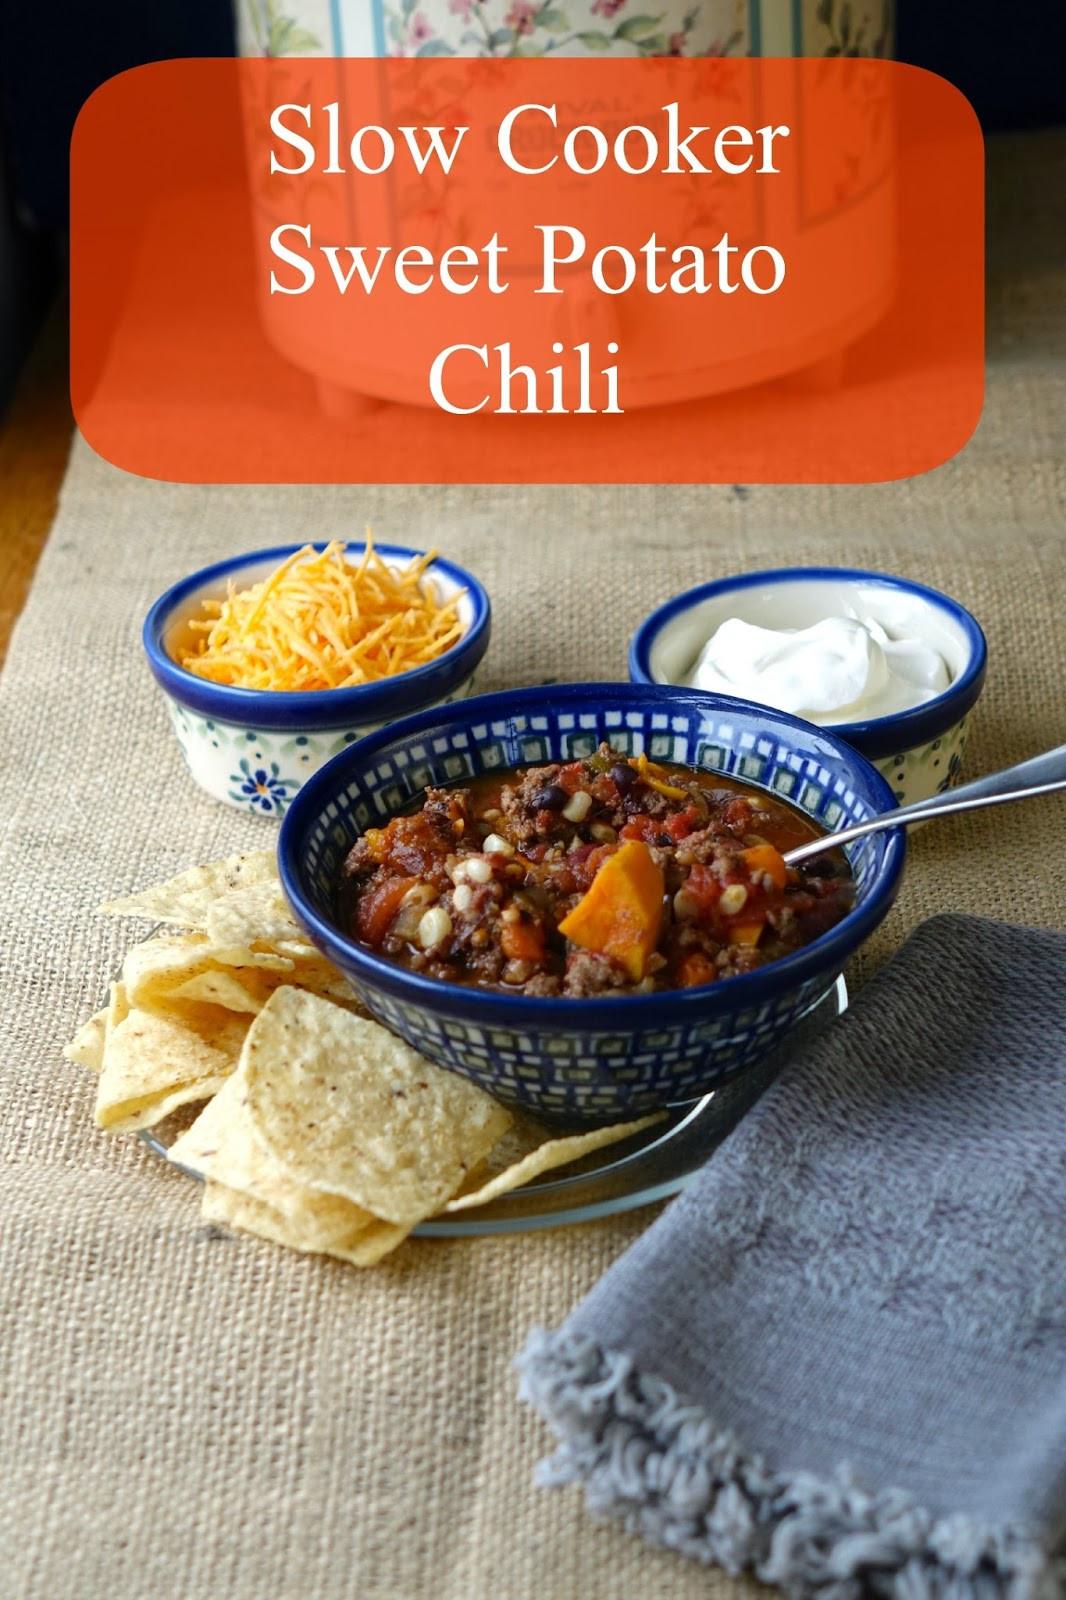 Sweet Potato Chili Slow Cooker  Farm Fresh Feasts Slow Cooker Sweet Potato Chili with